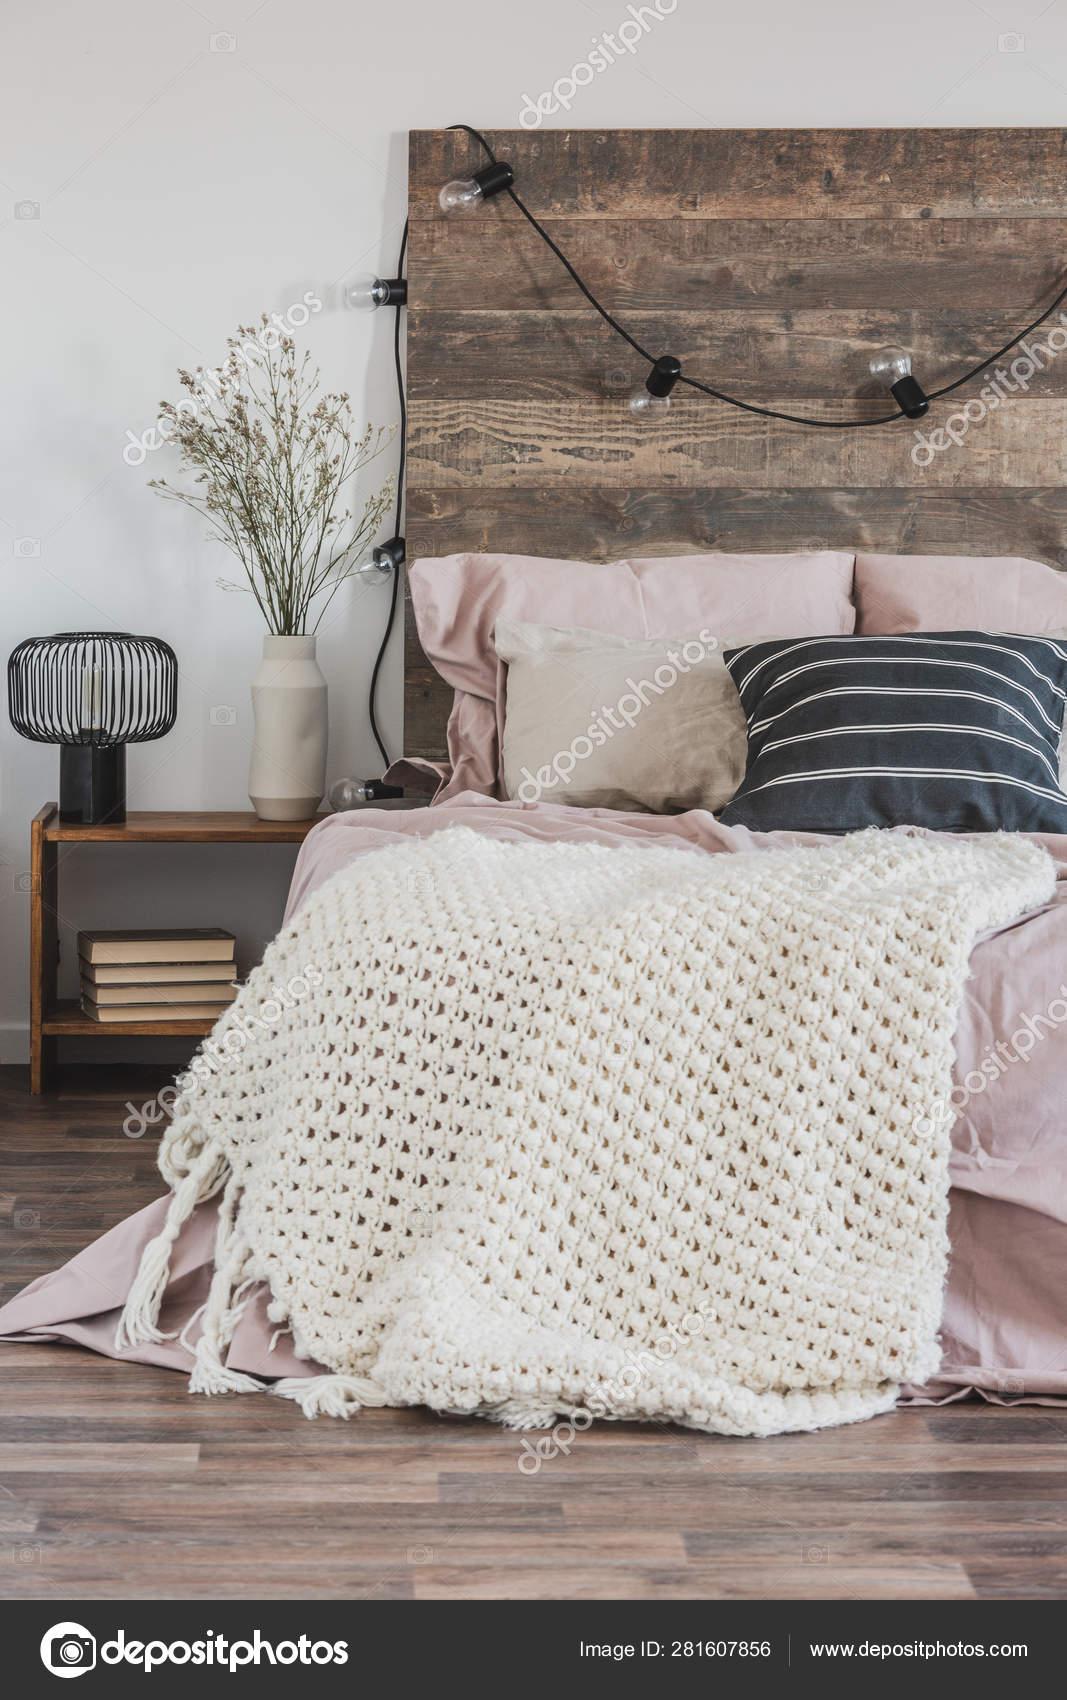 Beautiful Bedroom Interior With King Size Bed Wooden Headboard Stock Photo C Photographee Eu 281607856